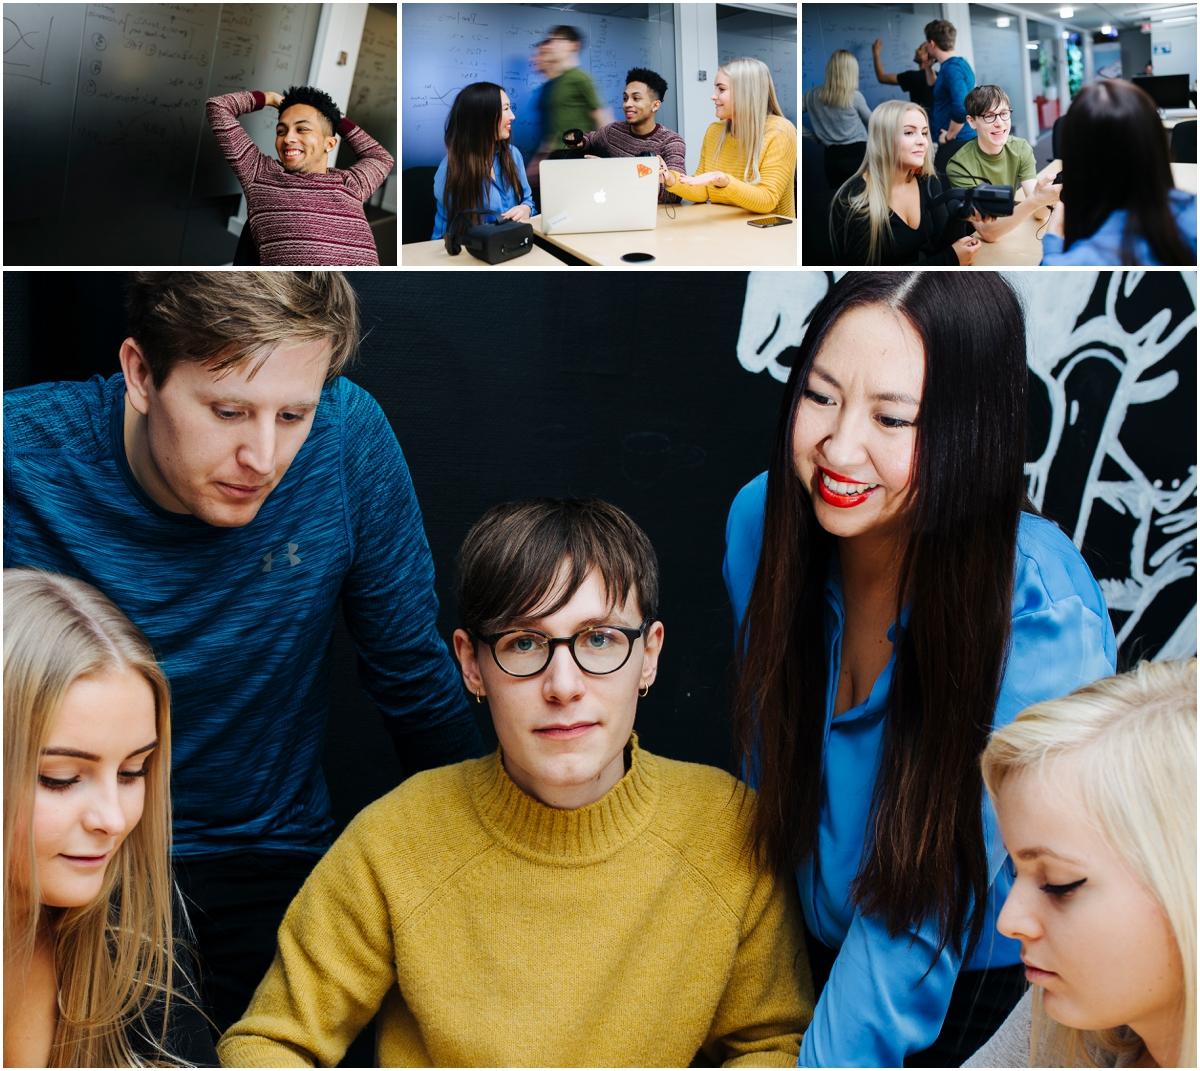 360You-photography-foretagsfotograf-foretagsportratt-stockholm-vallentuna-taby-bildbank-nackademin-8.jpg